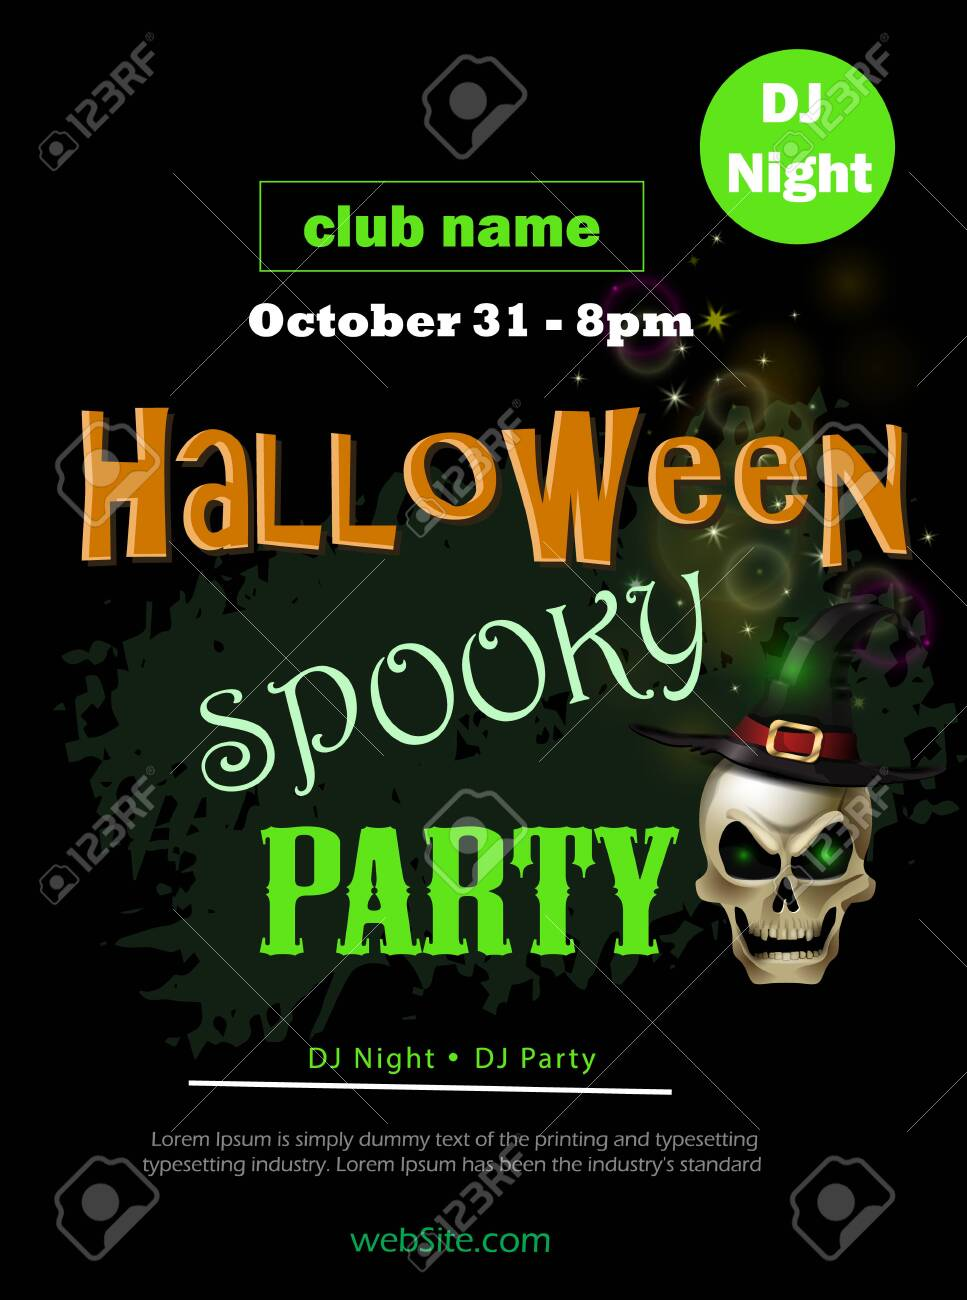 Halloween party flyer on black vector - 156251227